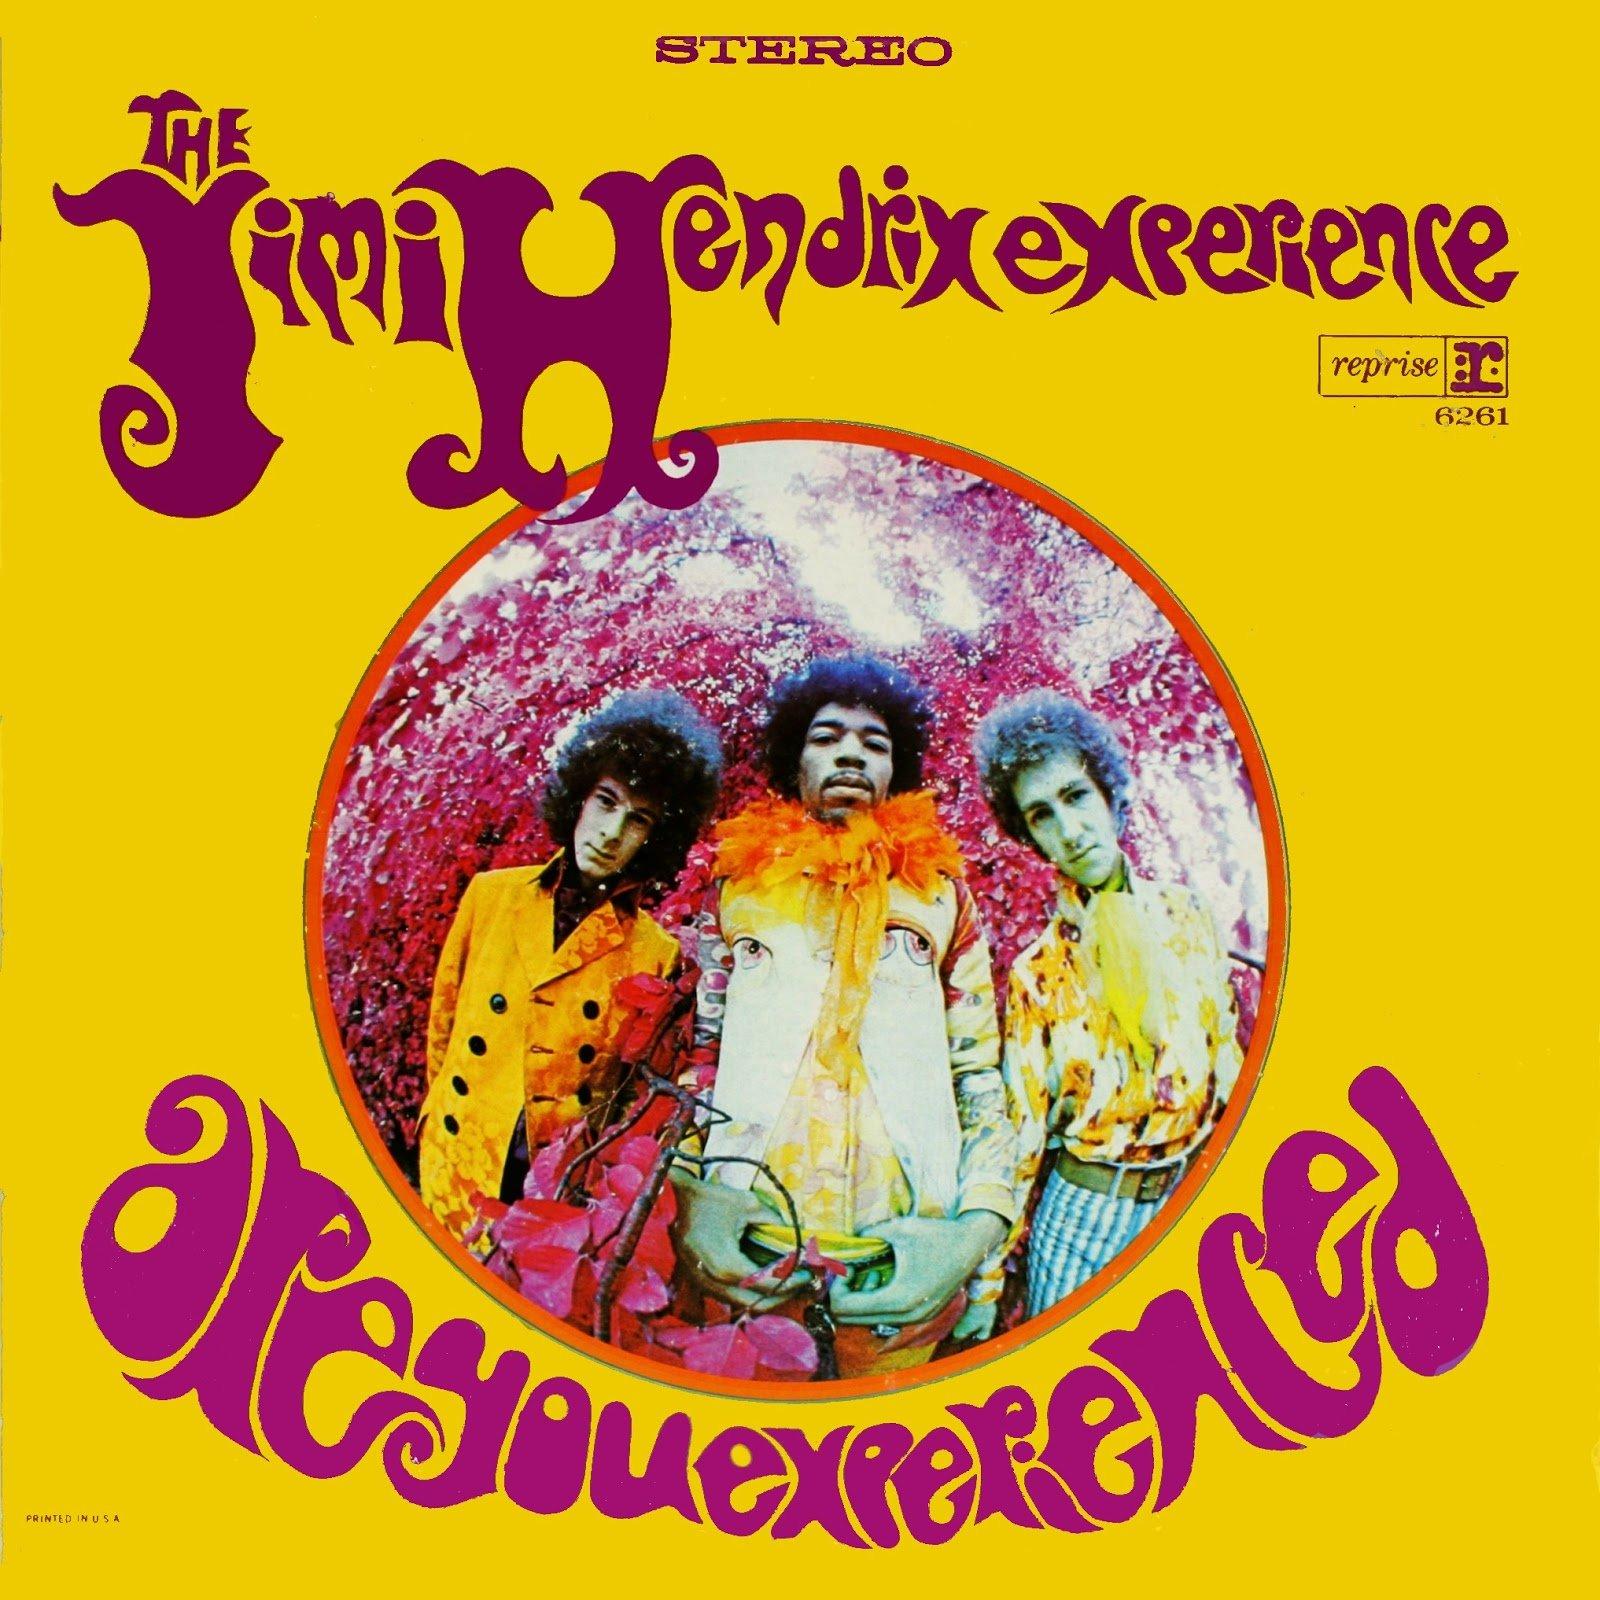 ARE YOU EXPERIENCED? – Jimi Hendrix (1967)